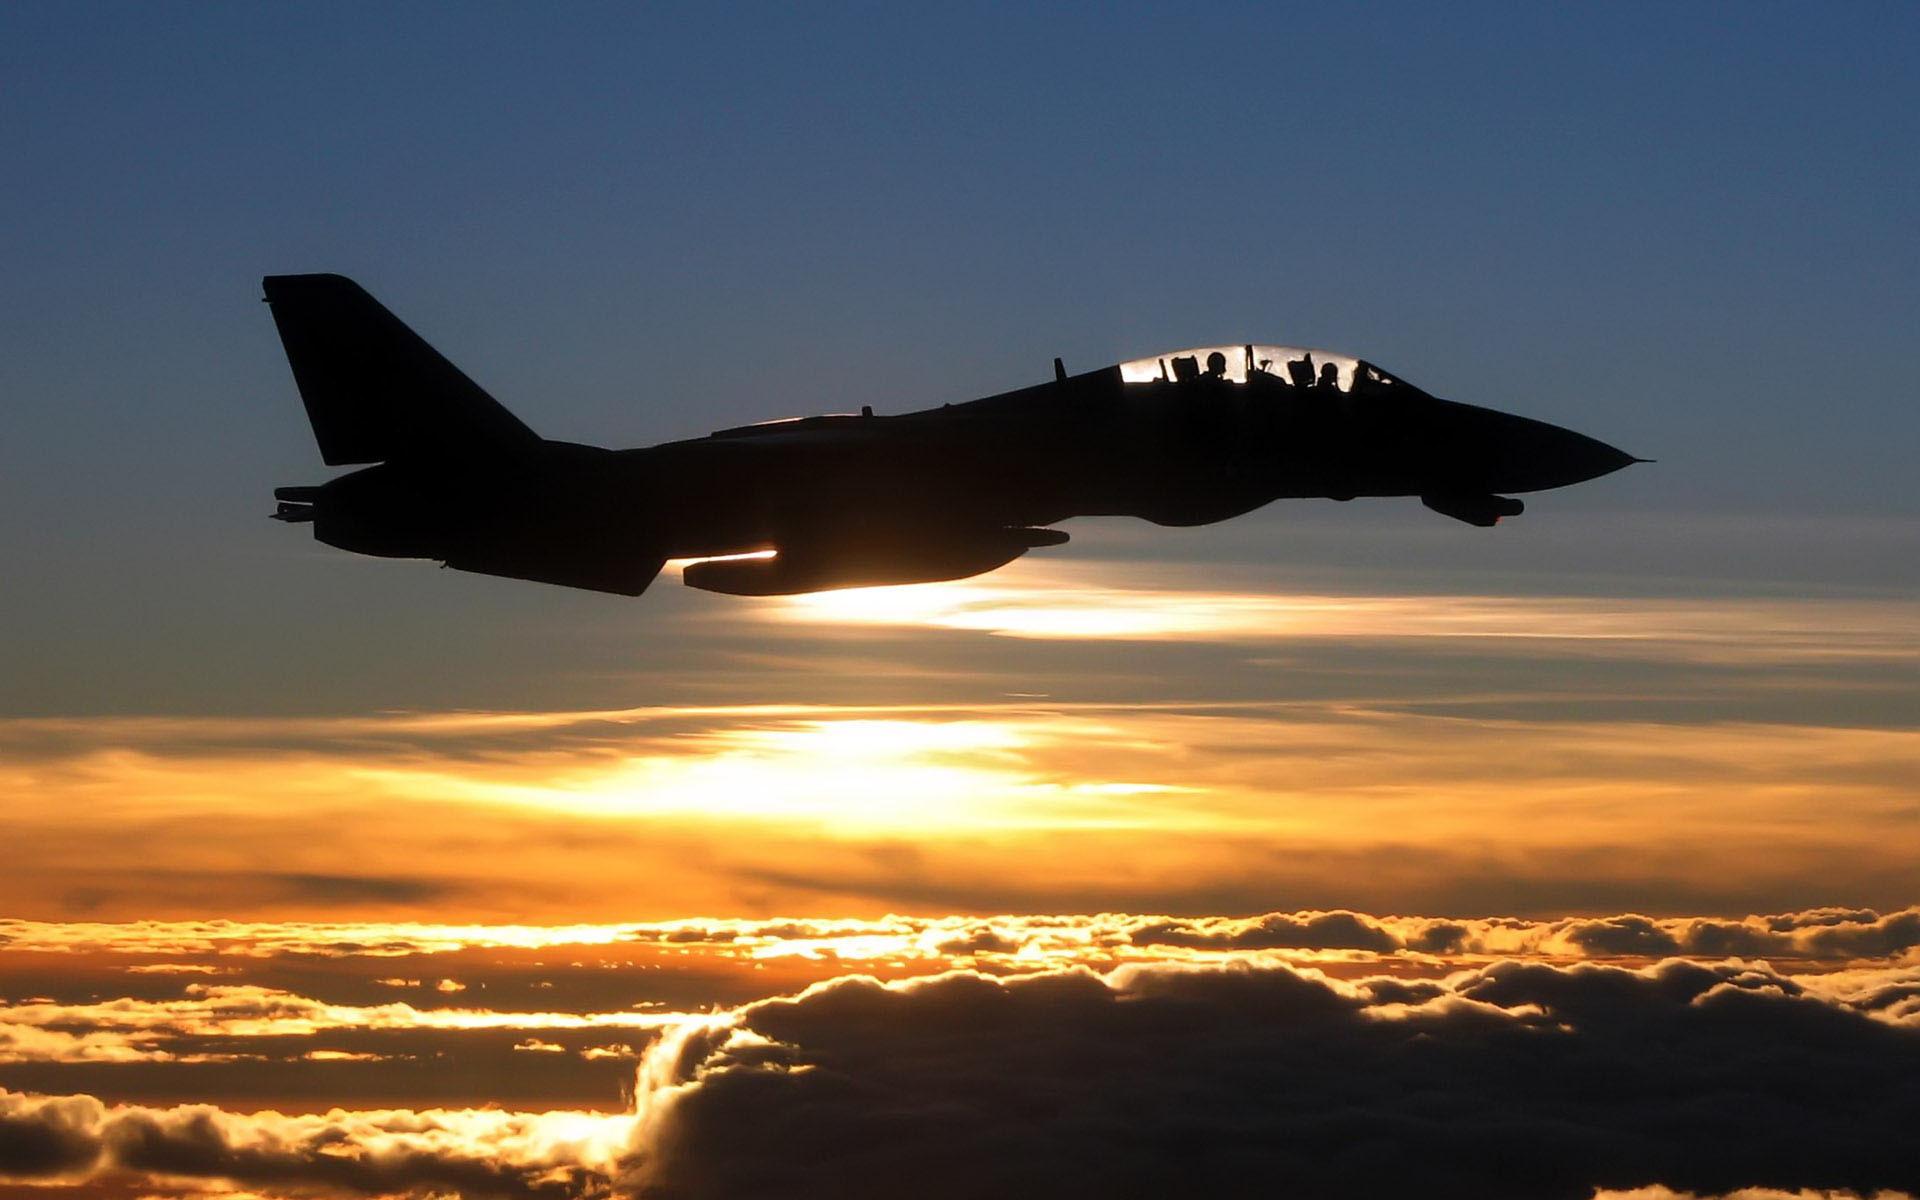 Grumman F-14 Tomcat sunset silhouette wallpaper